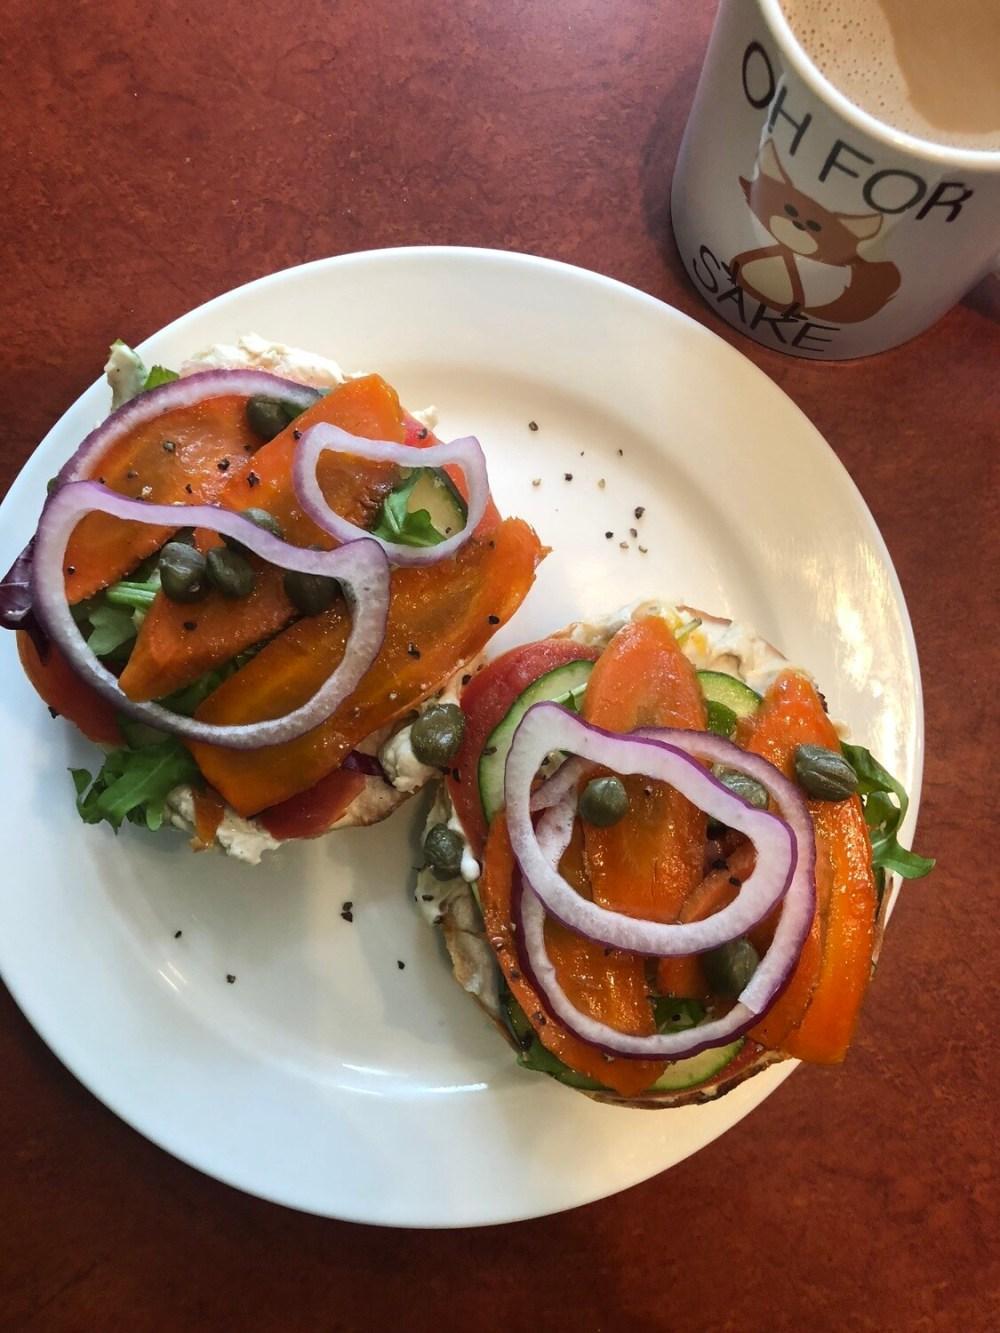 NY Bagel & Carrot Lox Platter (for 6)